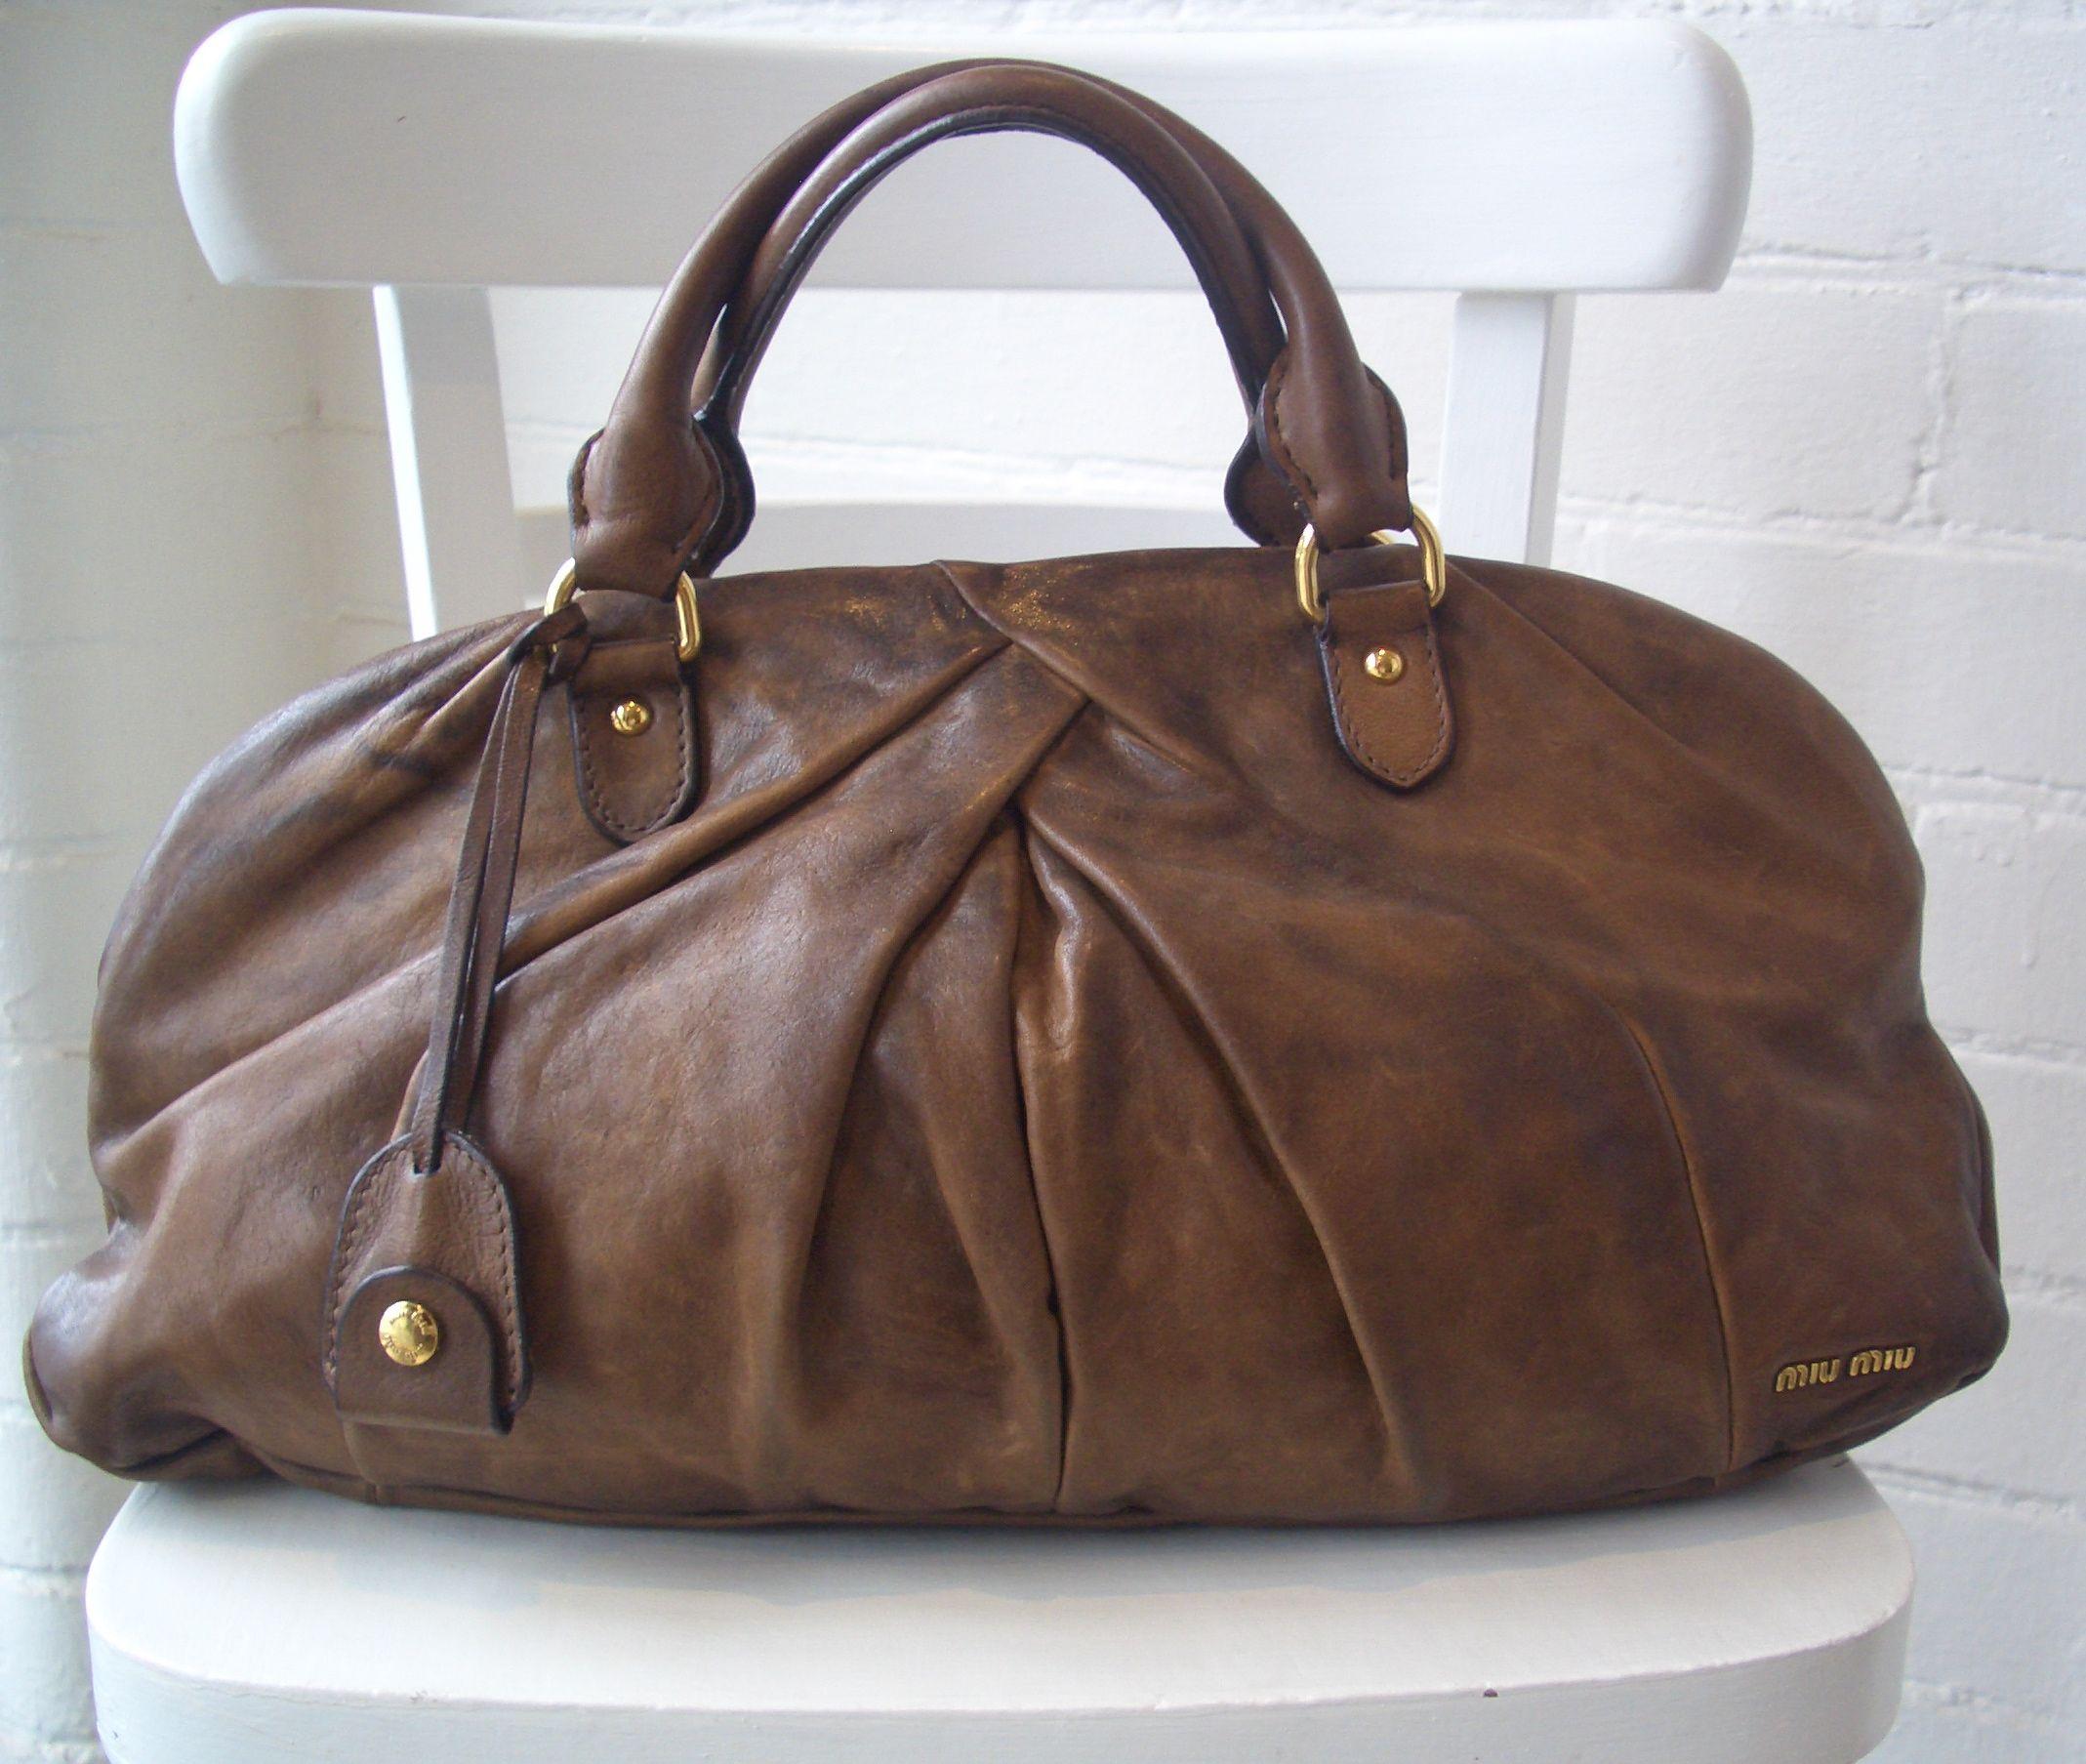 3ecc604748cb miu miu vintage bag brown with tassel and flower - Google Search ...